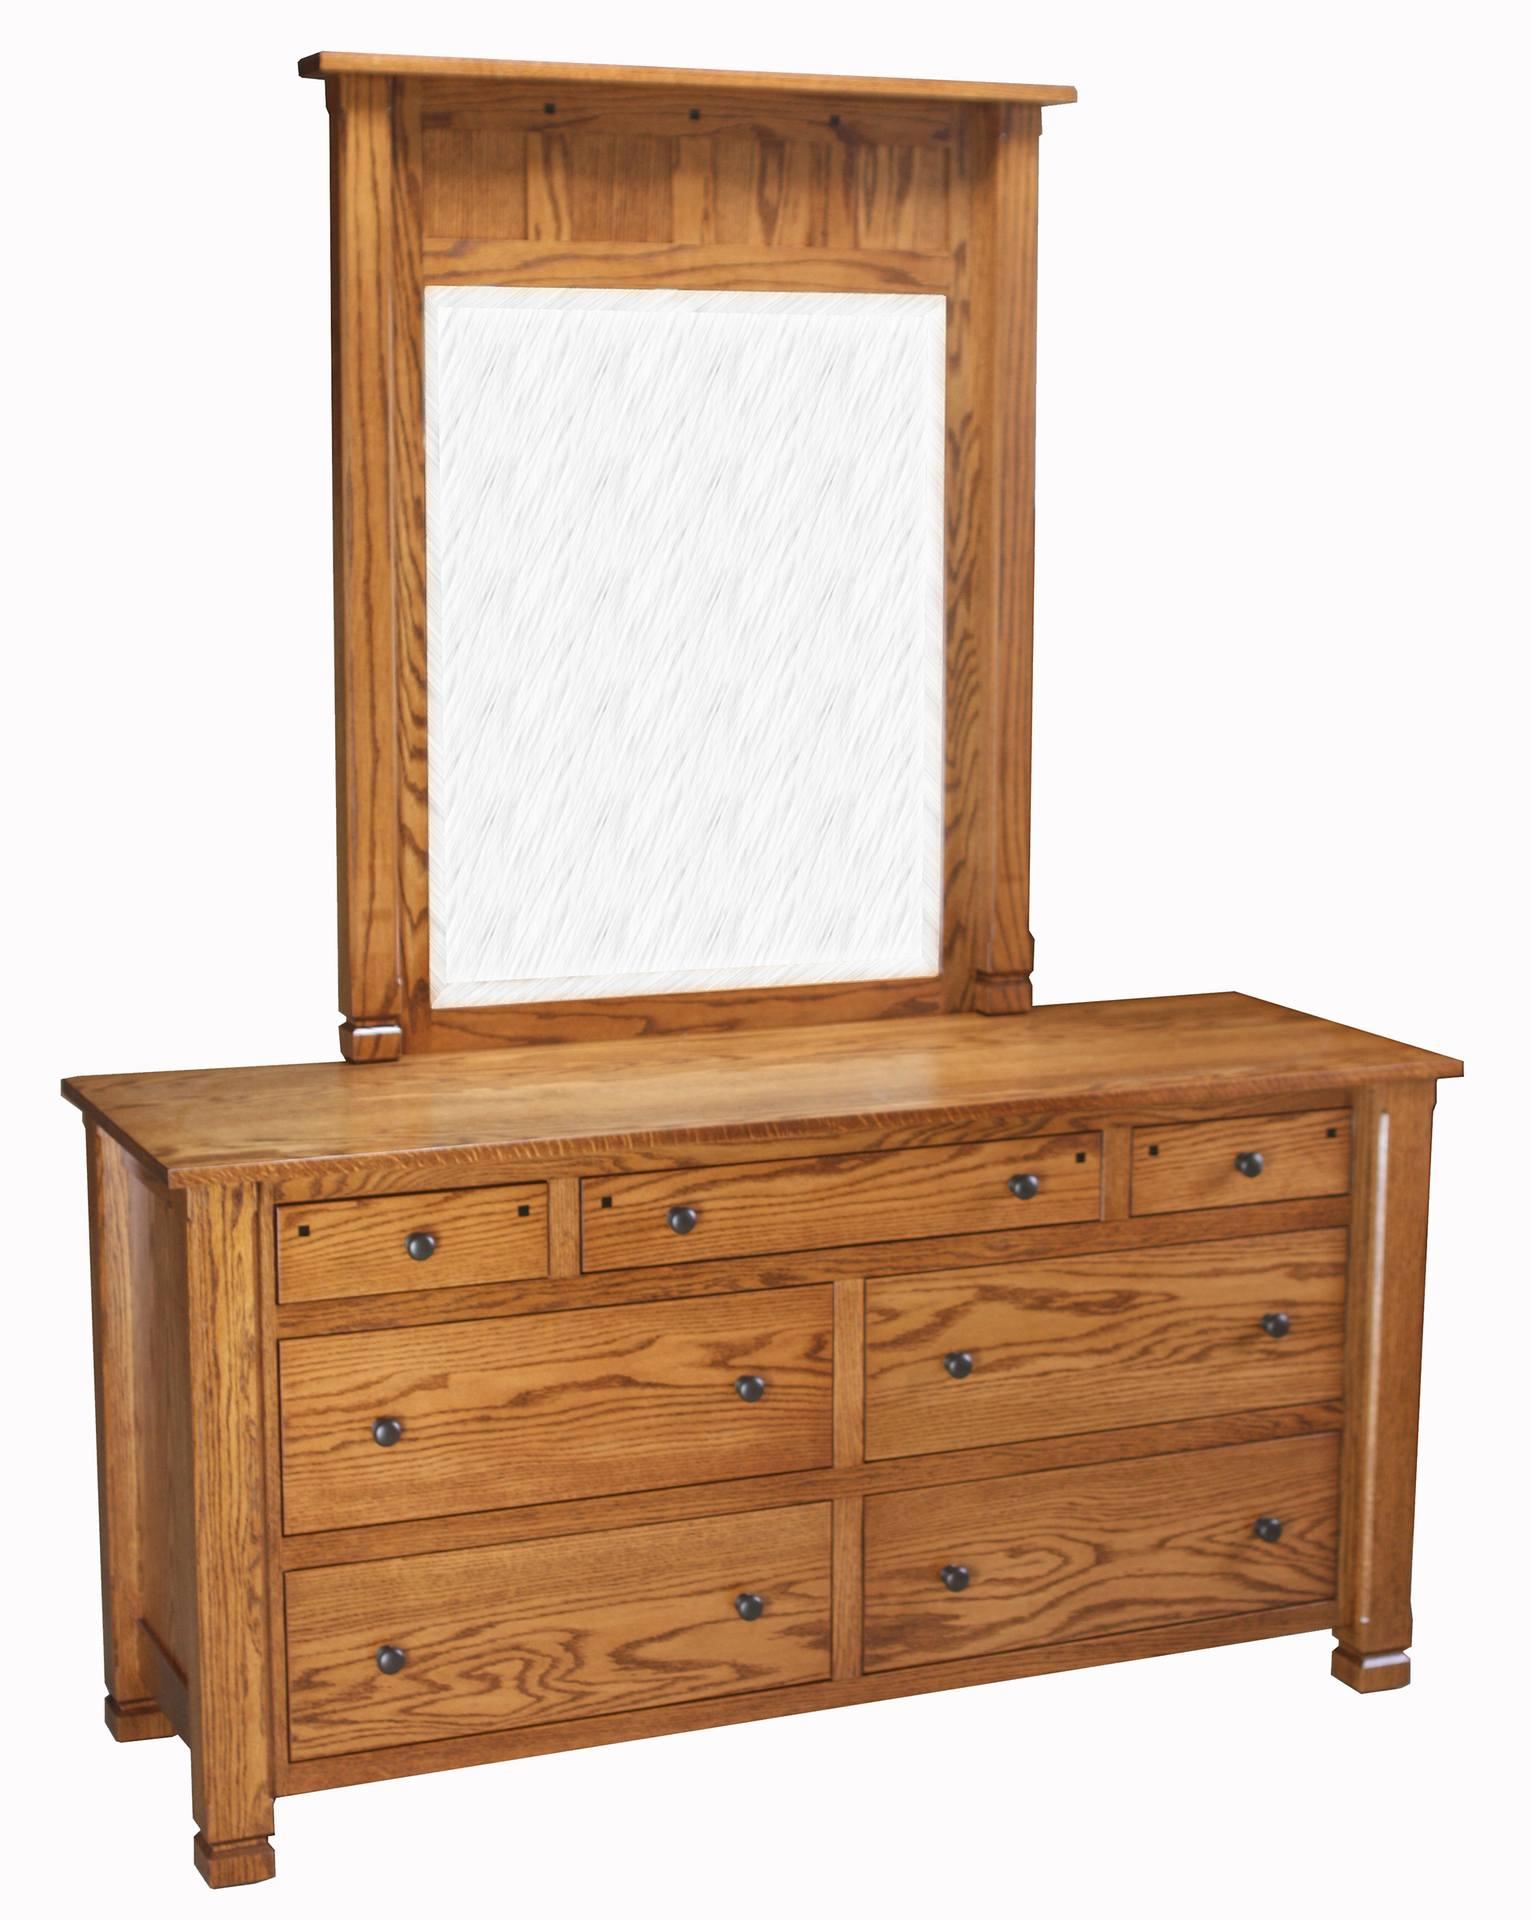 Brockport Seven Drawer Dresser with Mirror